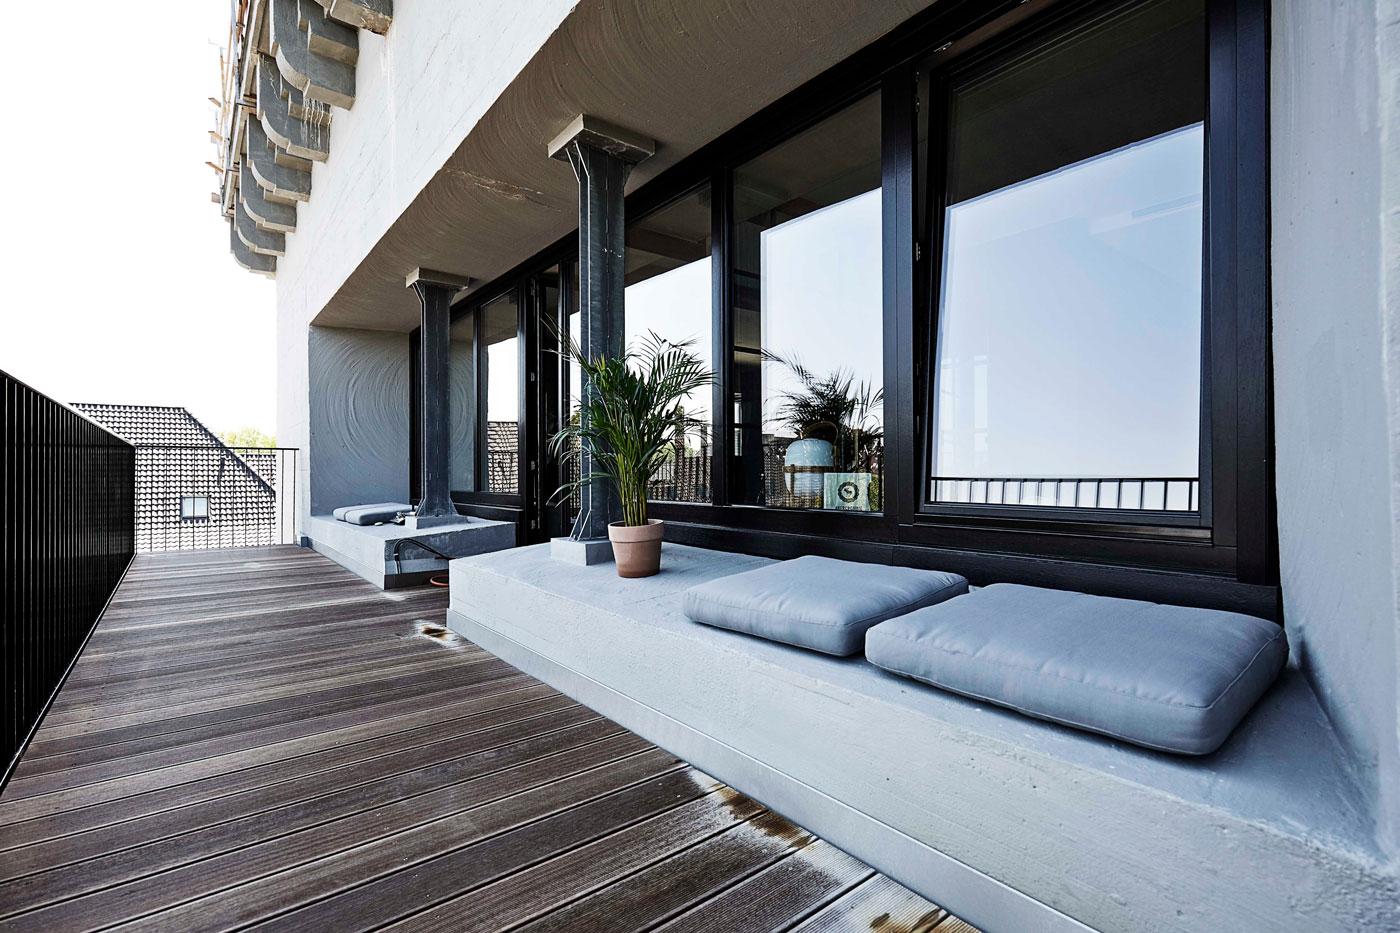 Balcony, seating area